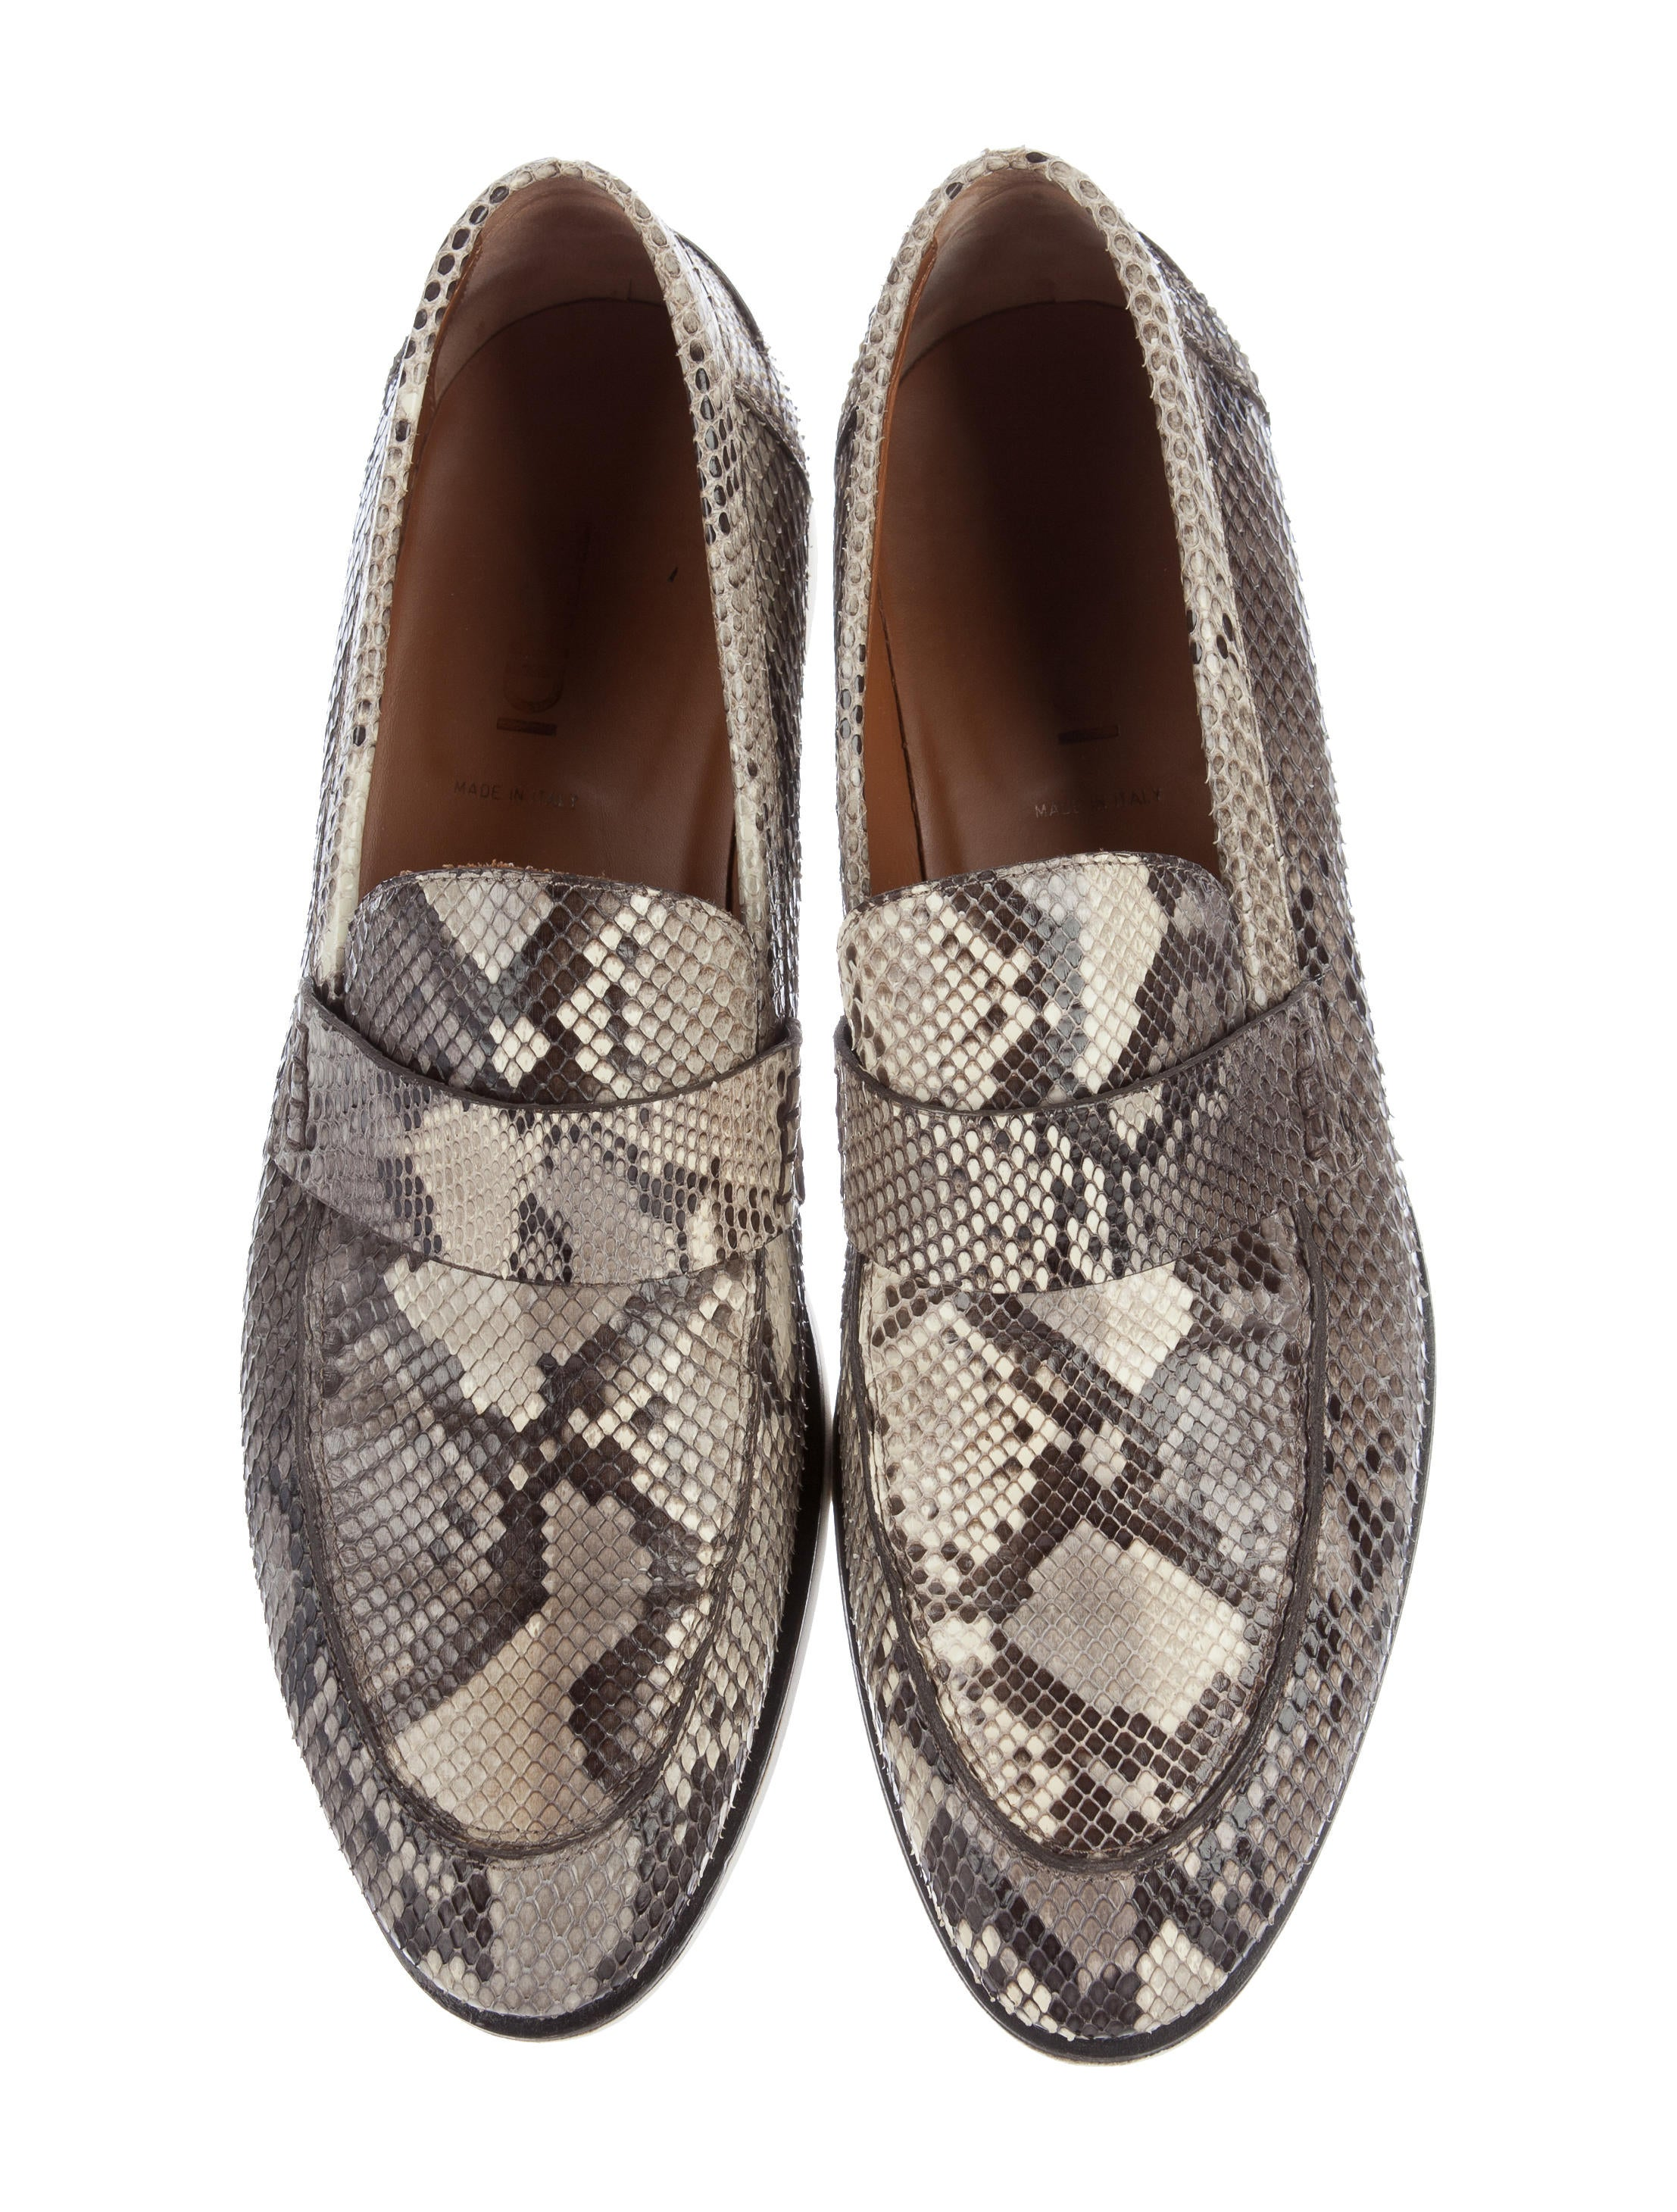 Real Snakeskin Dress Shoes